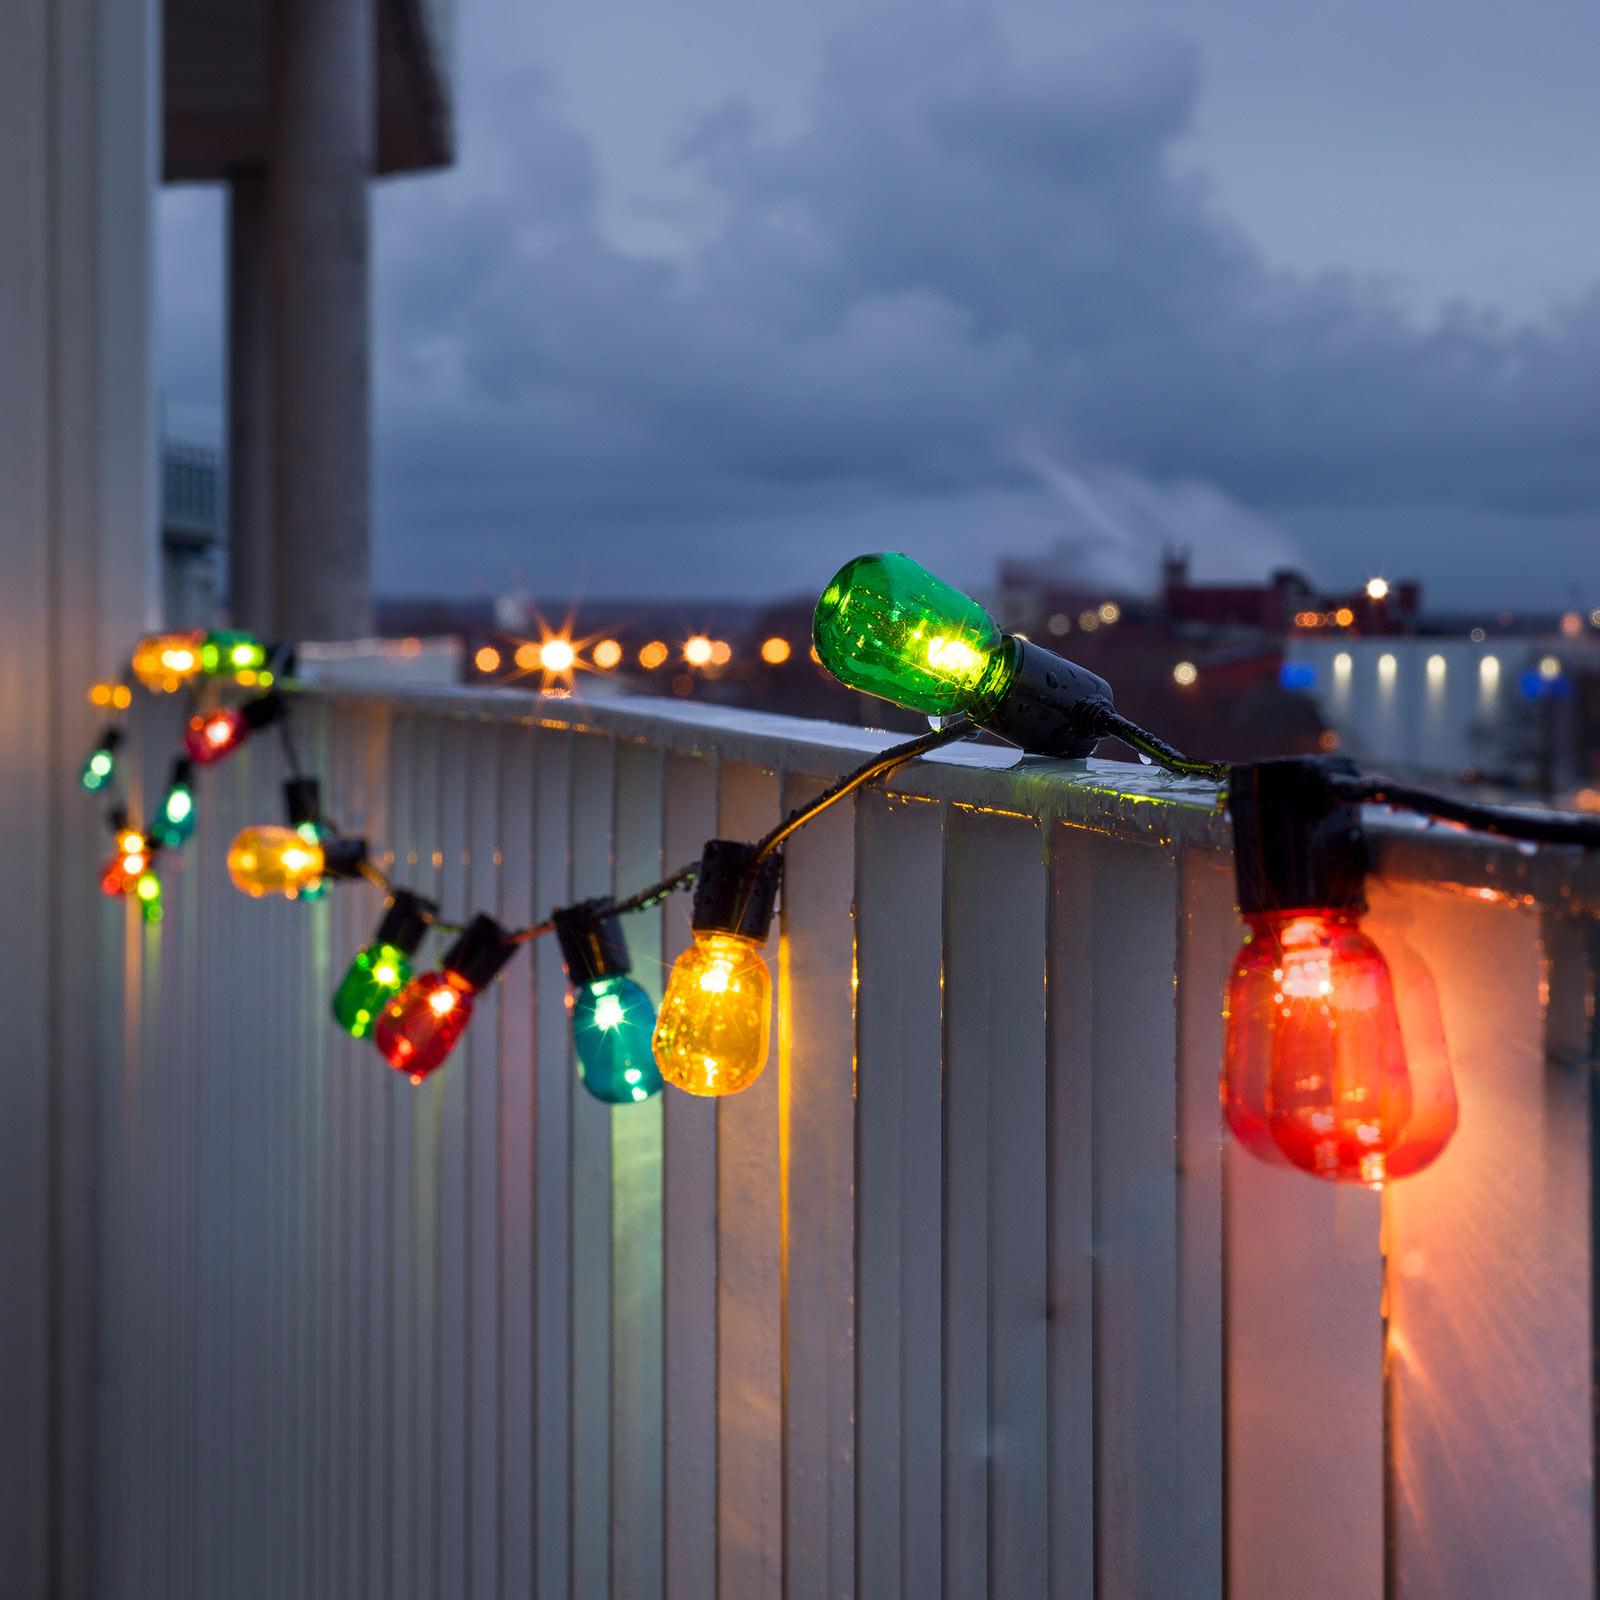 Lyskæde Biergarten 40 LED-dråber kulørt